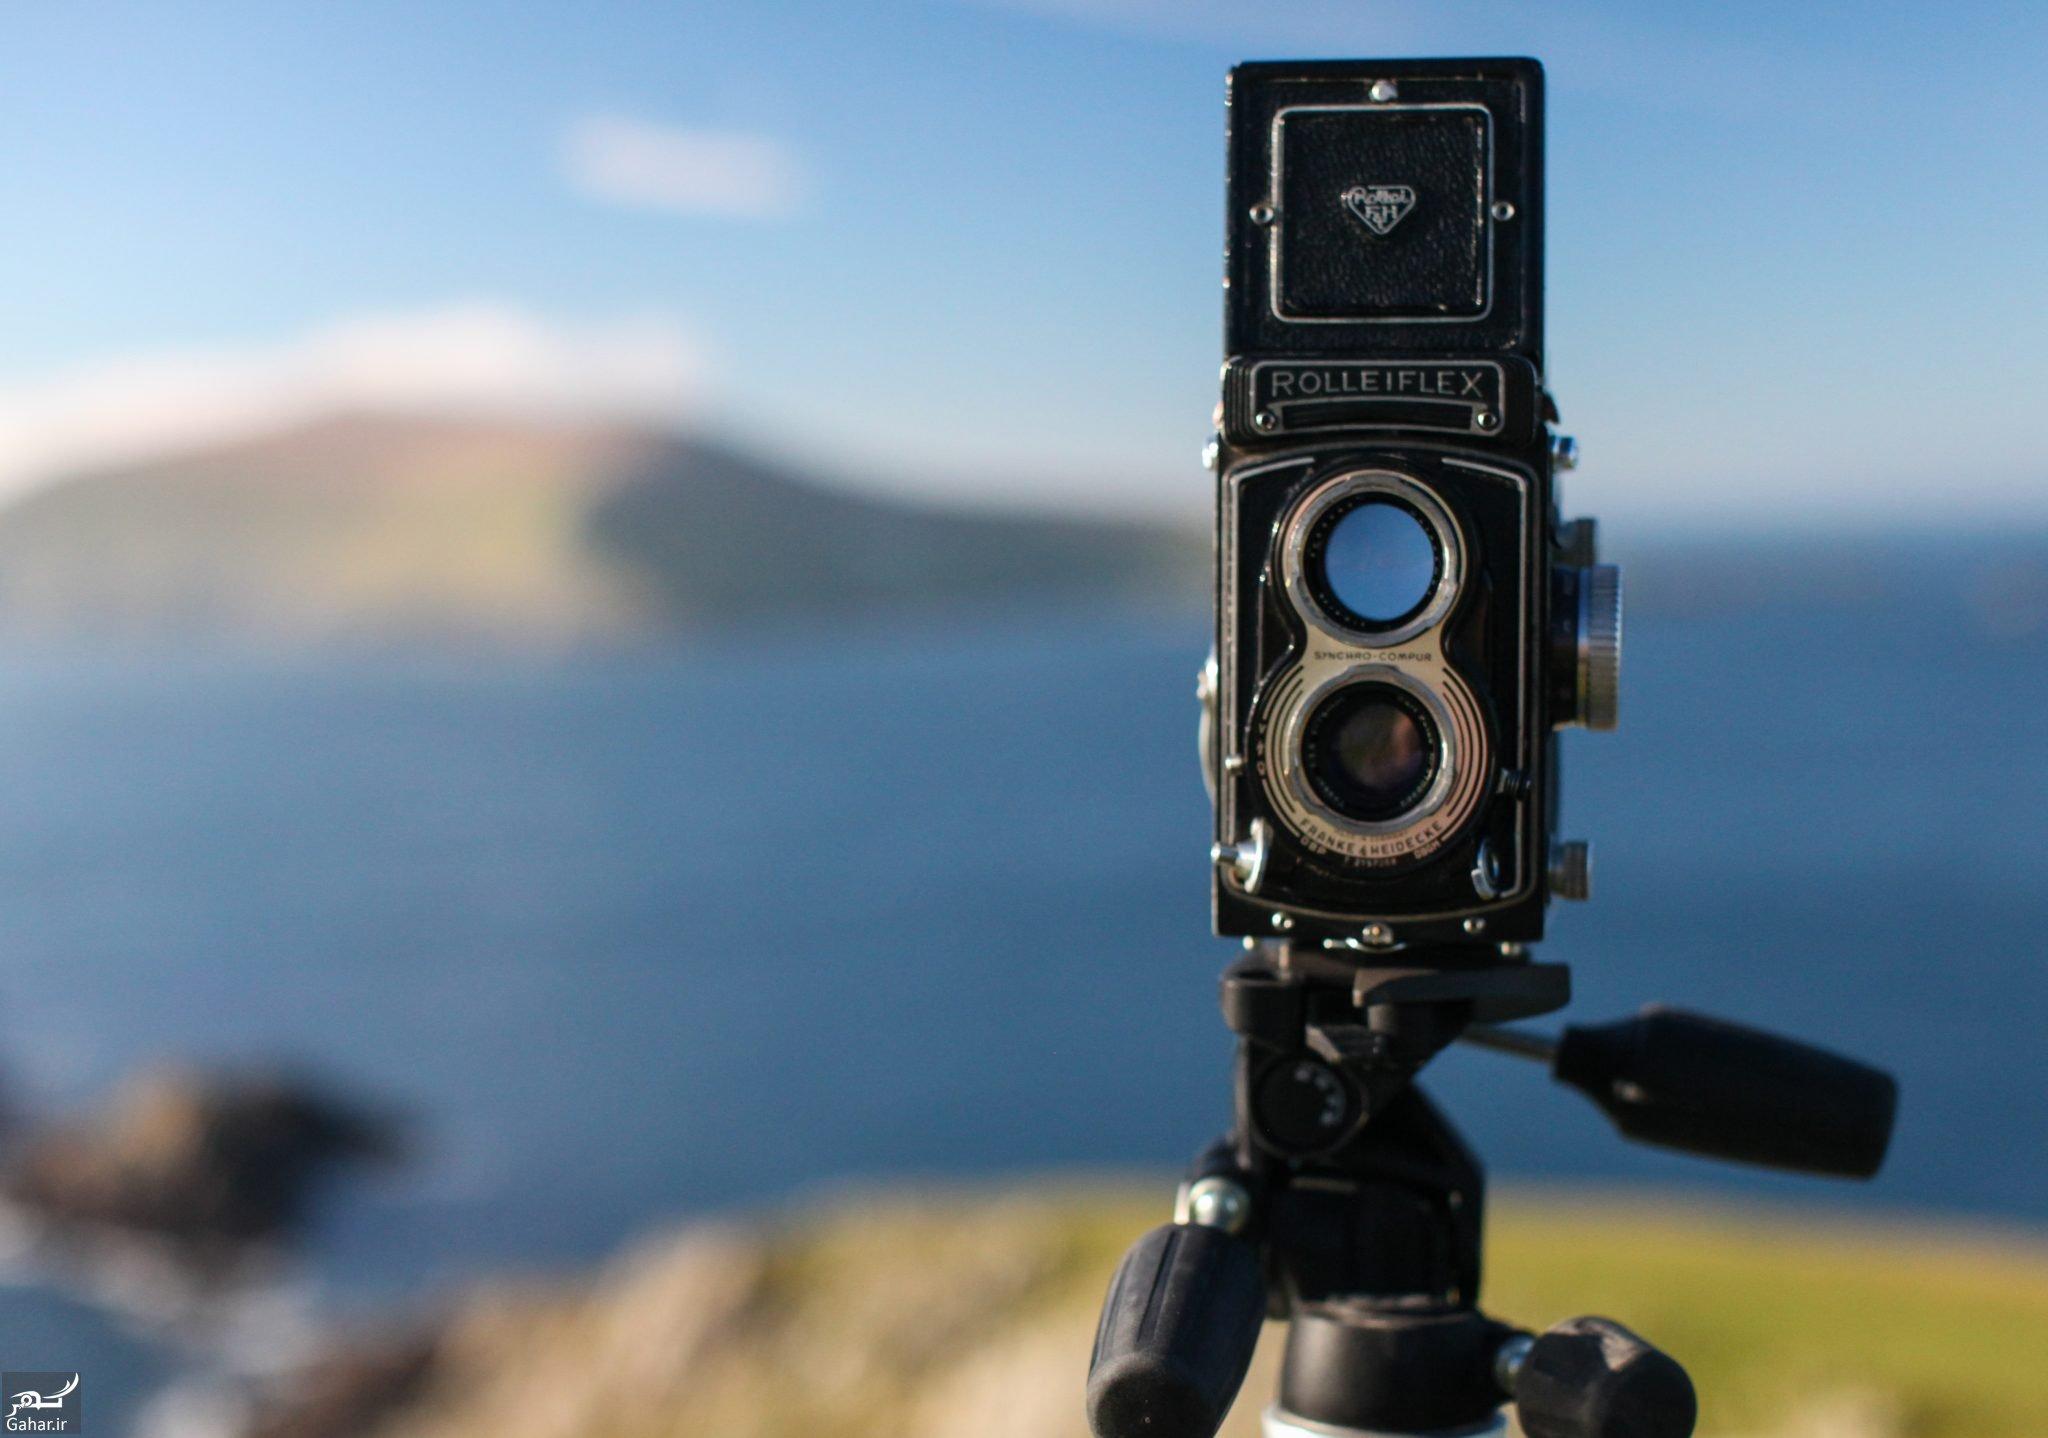 mataleb www.gahar .ir 08.10.97 10 لغات تخصصی و اصطلاحات عکاسی و فیلمبرداری